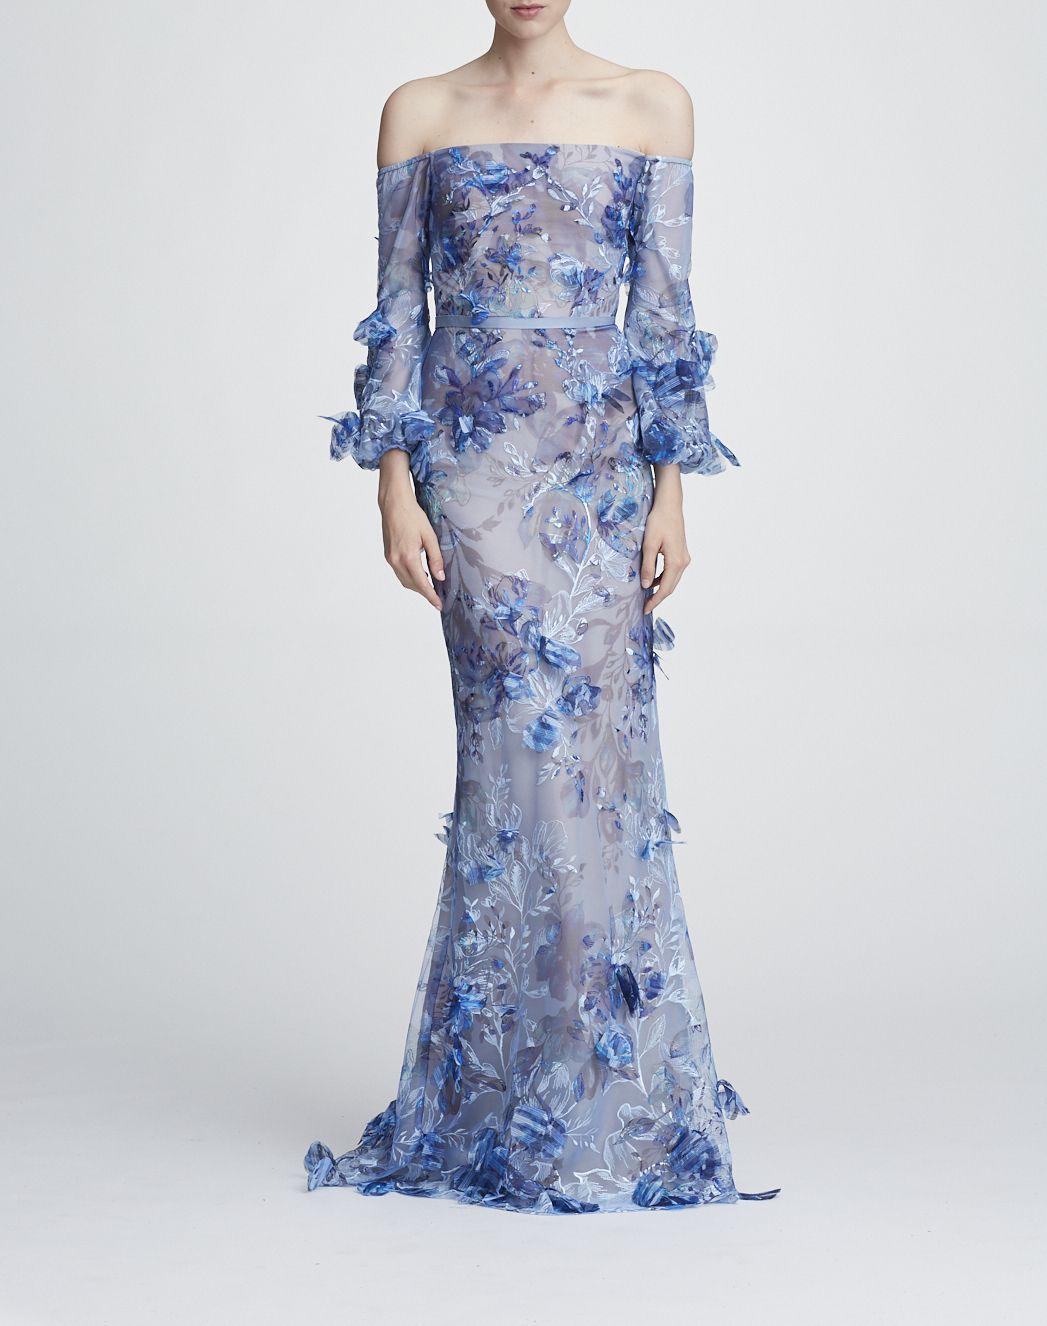 0a8ffdf4f829 Marchesa Notte Off the Shoulder Embroidered Gown N27G0731 Abito Lungo Fino  Ai Piedi